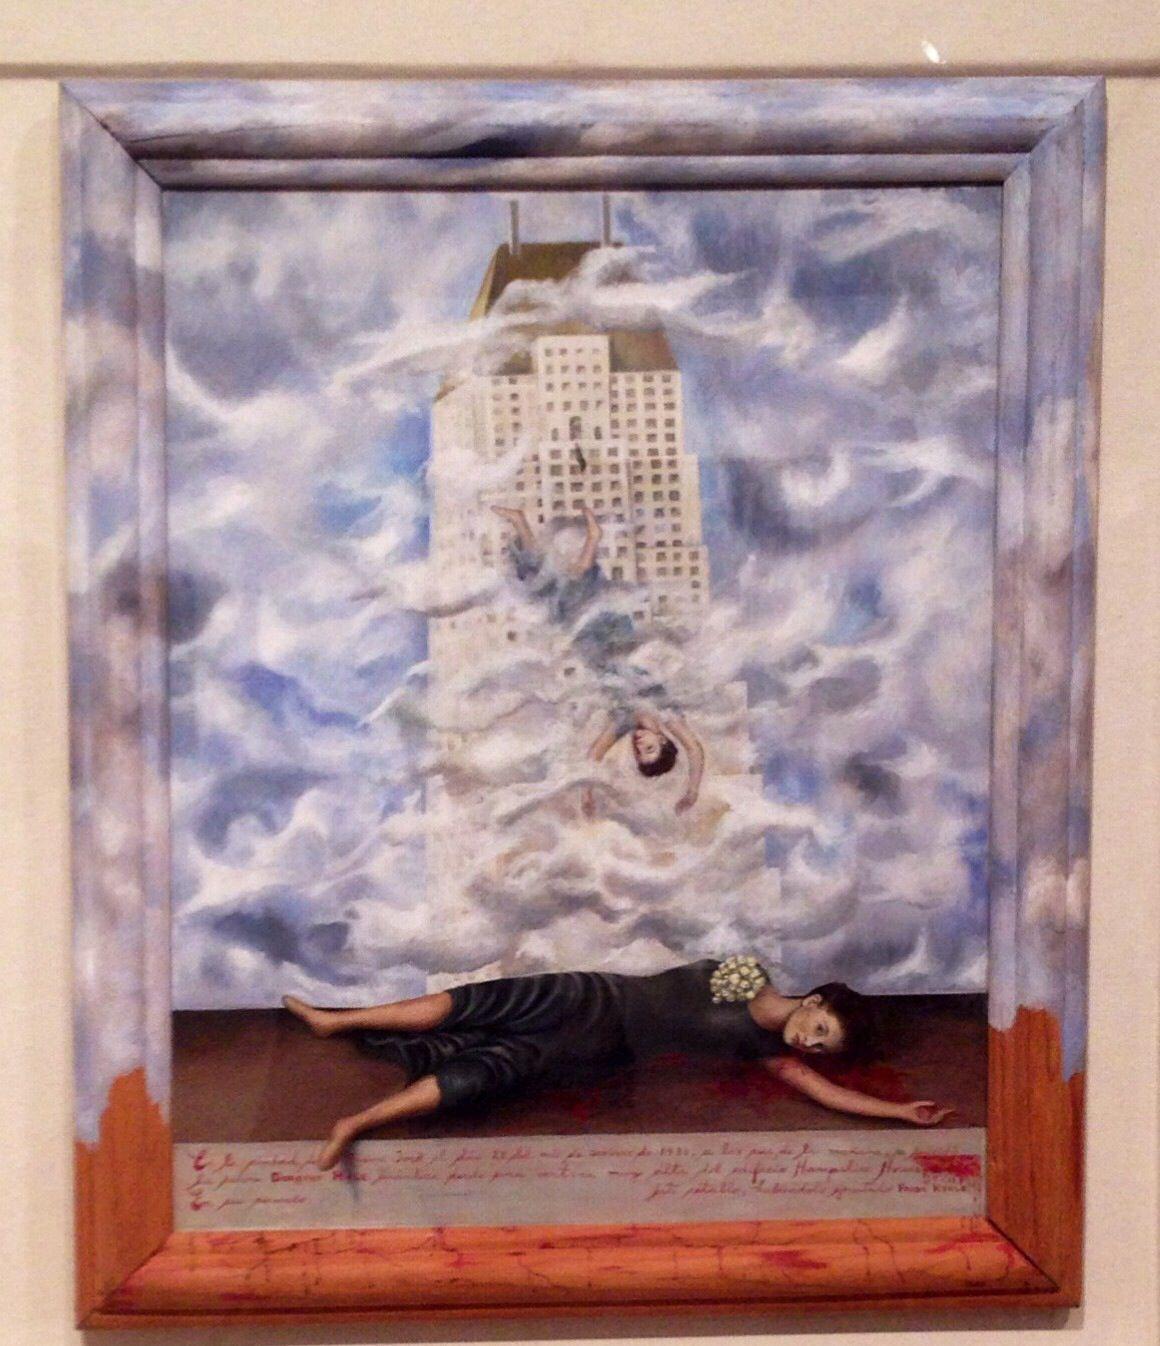 Kajjanbai,Colleen Dewhurst Hot archive Anne O'Neal,Helen Burgess